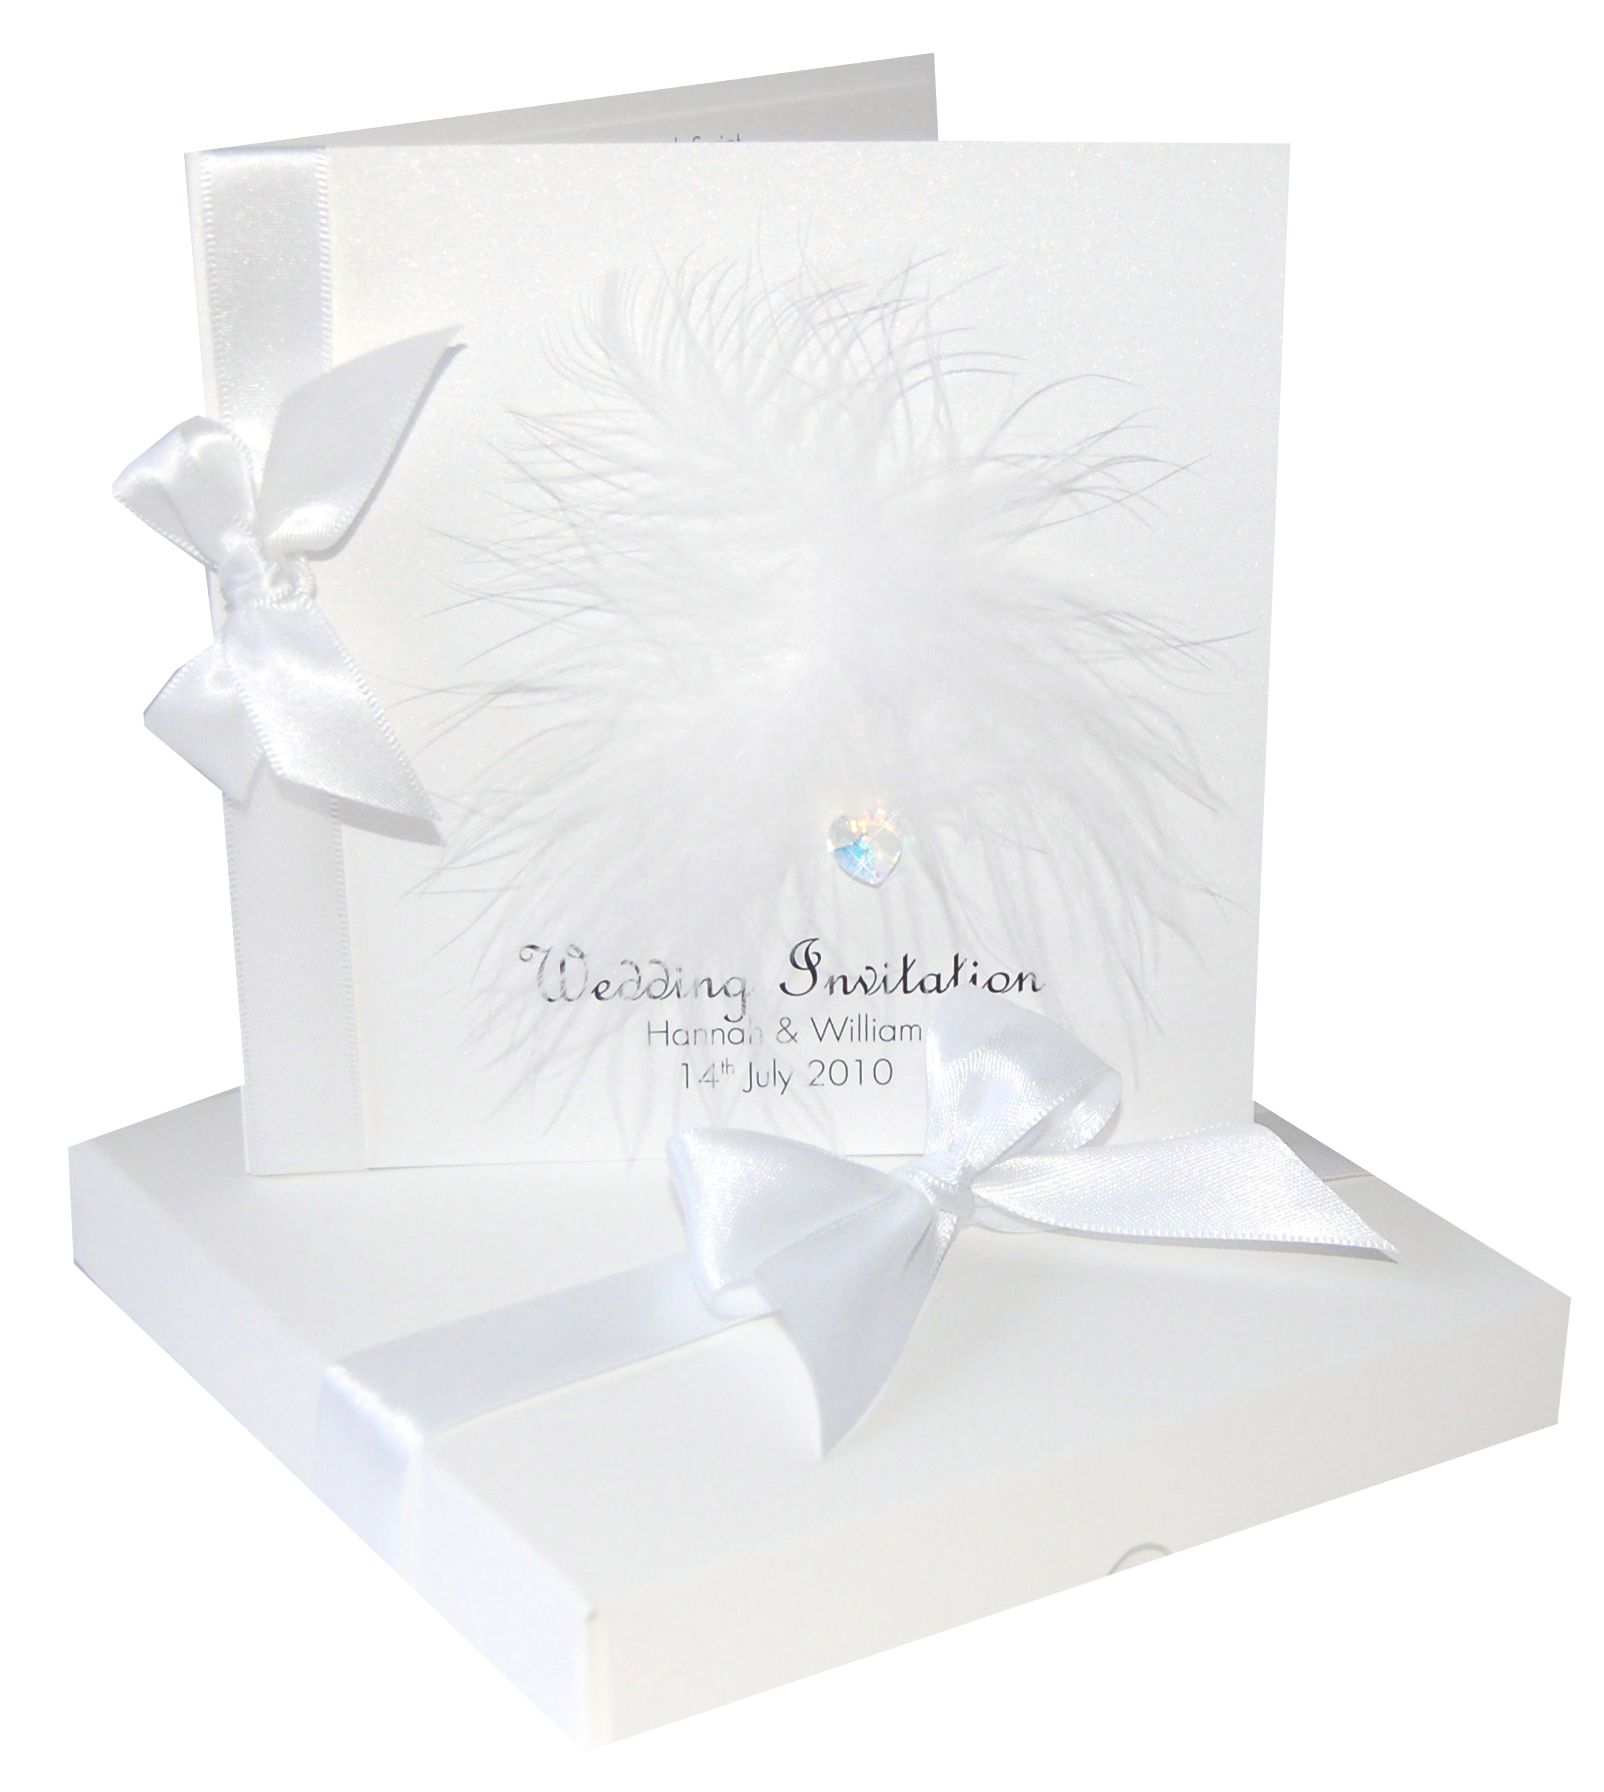 Mademoiselle wedding invitation, with stunning sparkly Swarovski ...